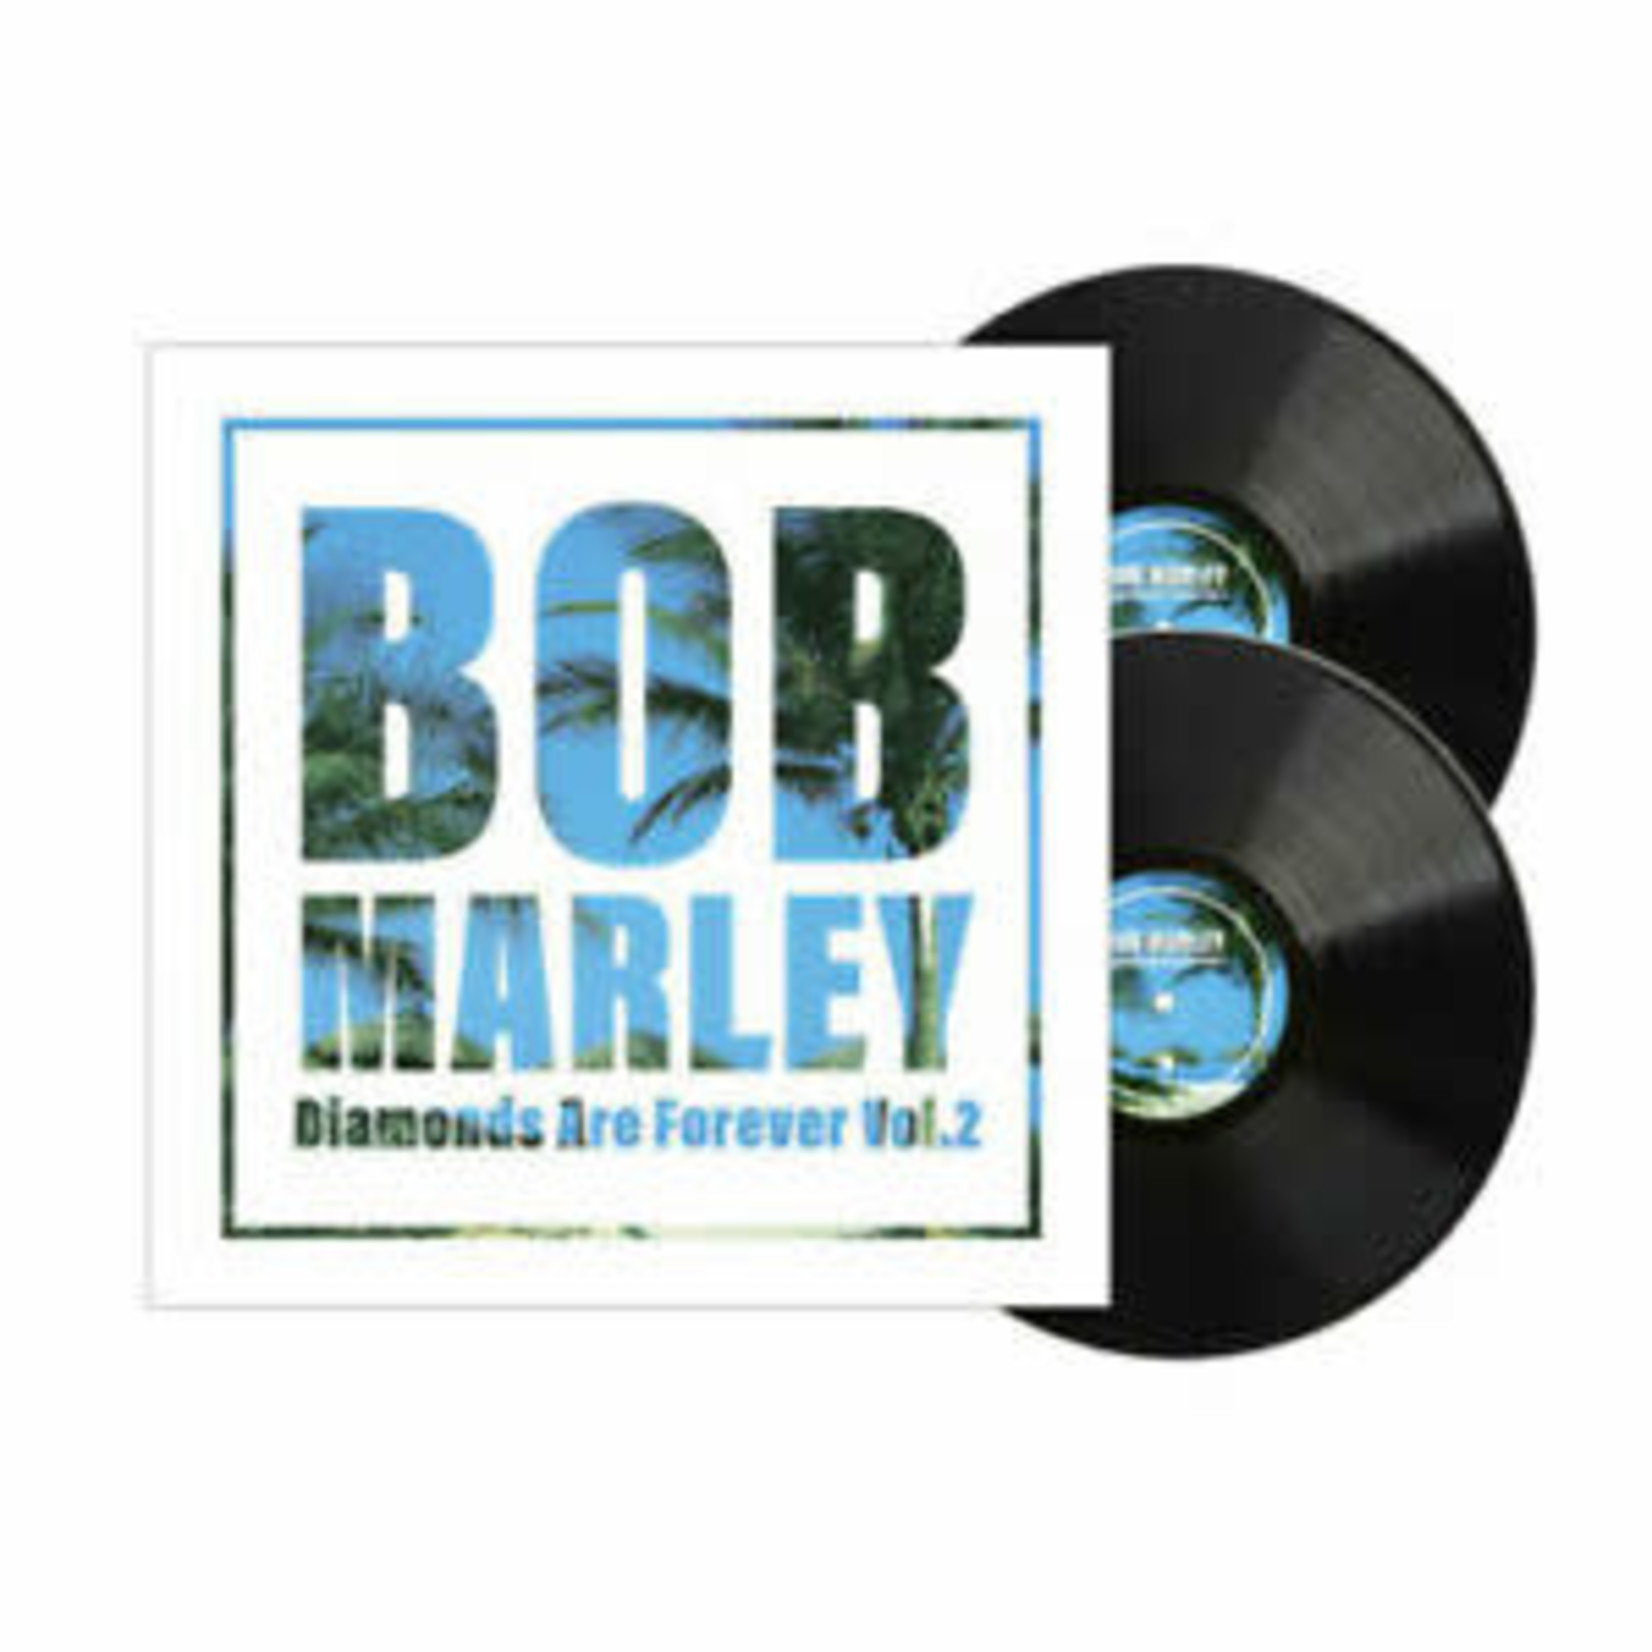 BOB MARLEY DIAMONDS ARE FOREVER VOL.2